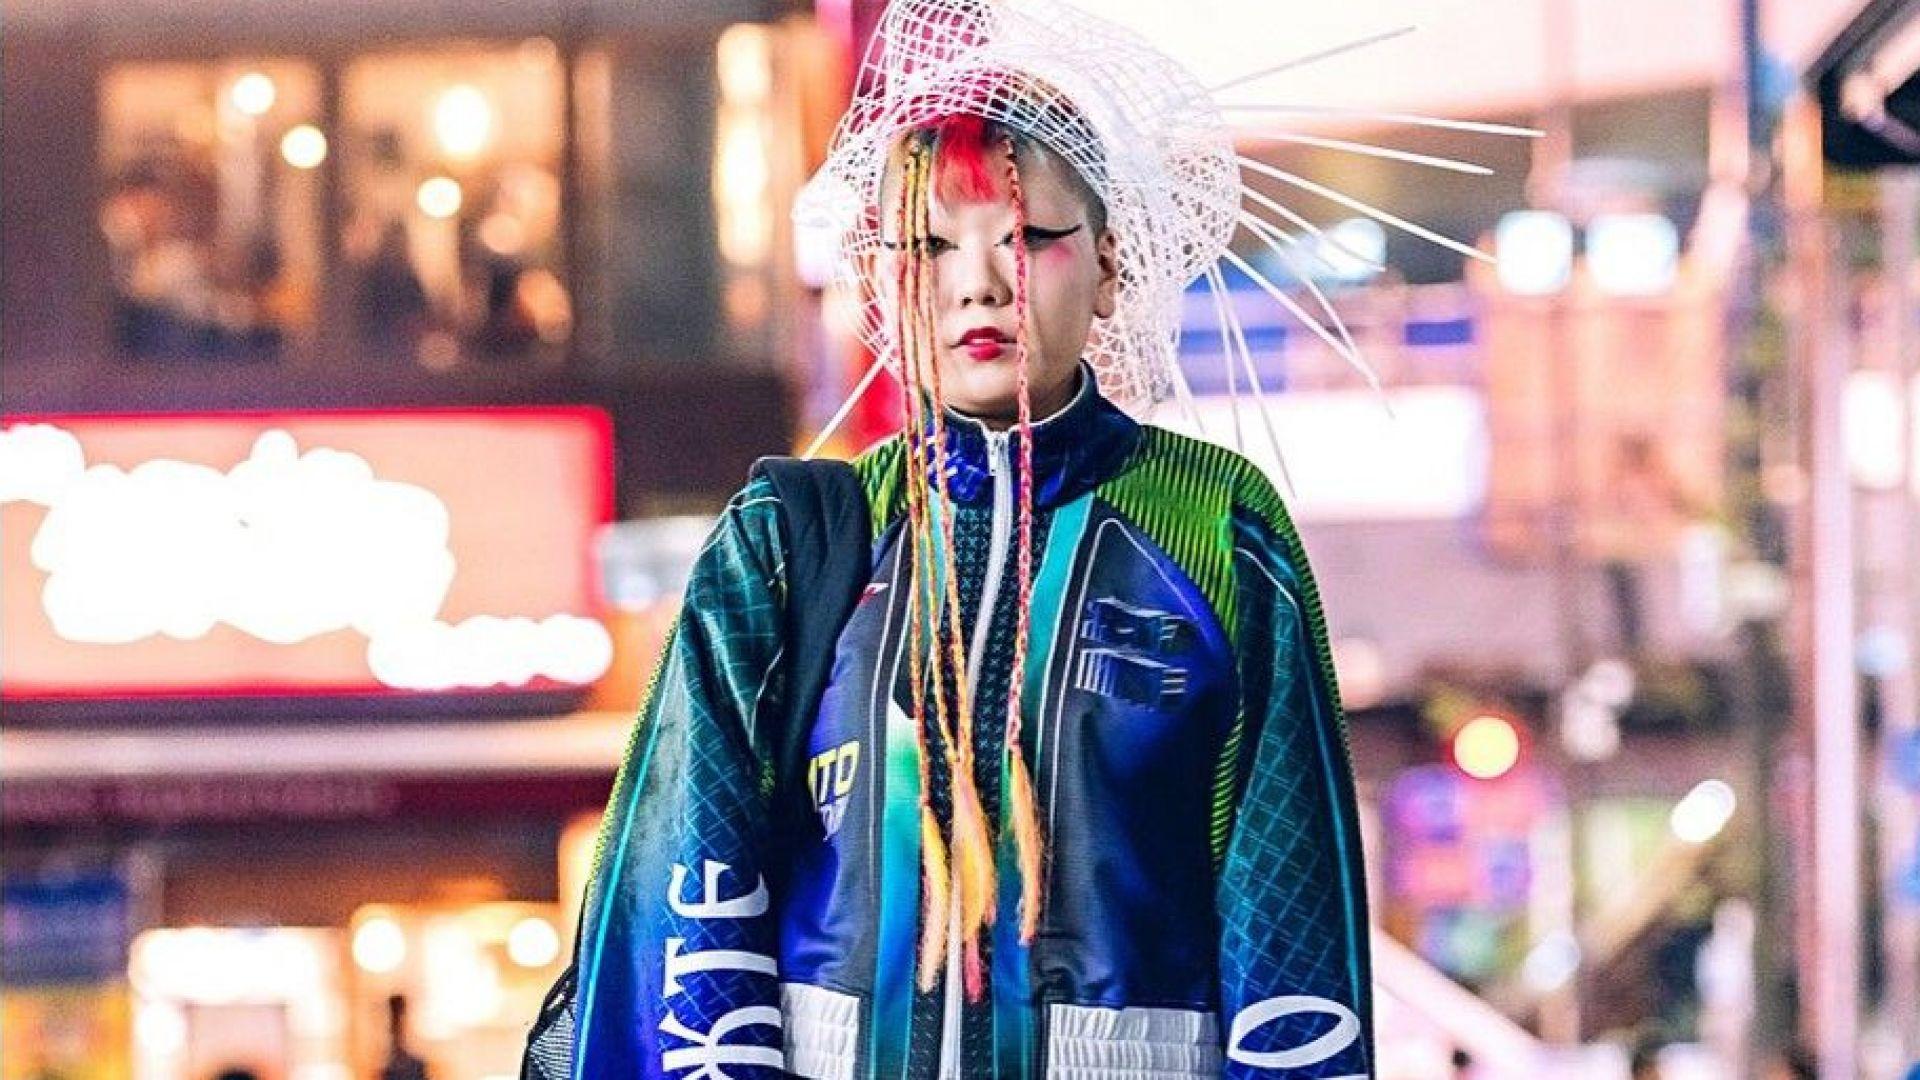 Български дизайнер скандализира с нецензурен надпис на Tokyo Fashion Week